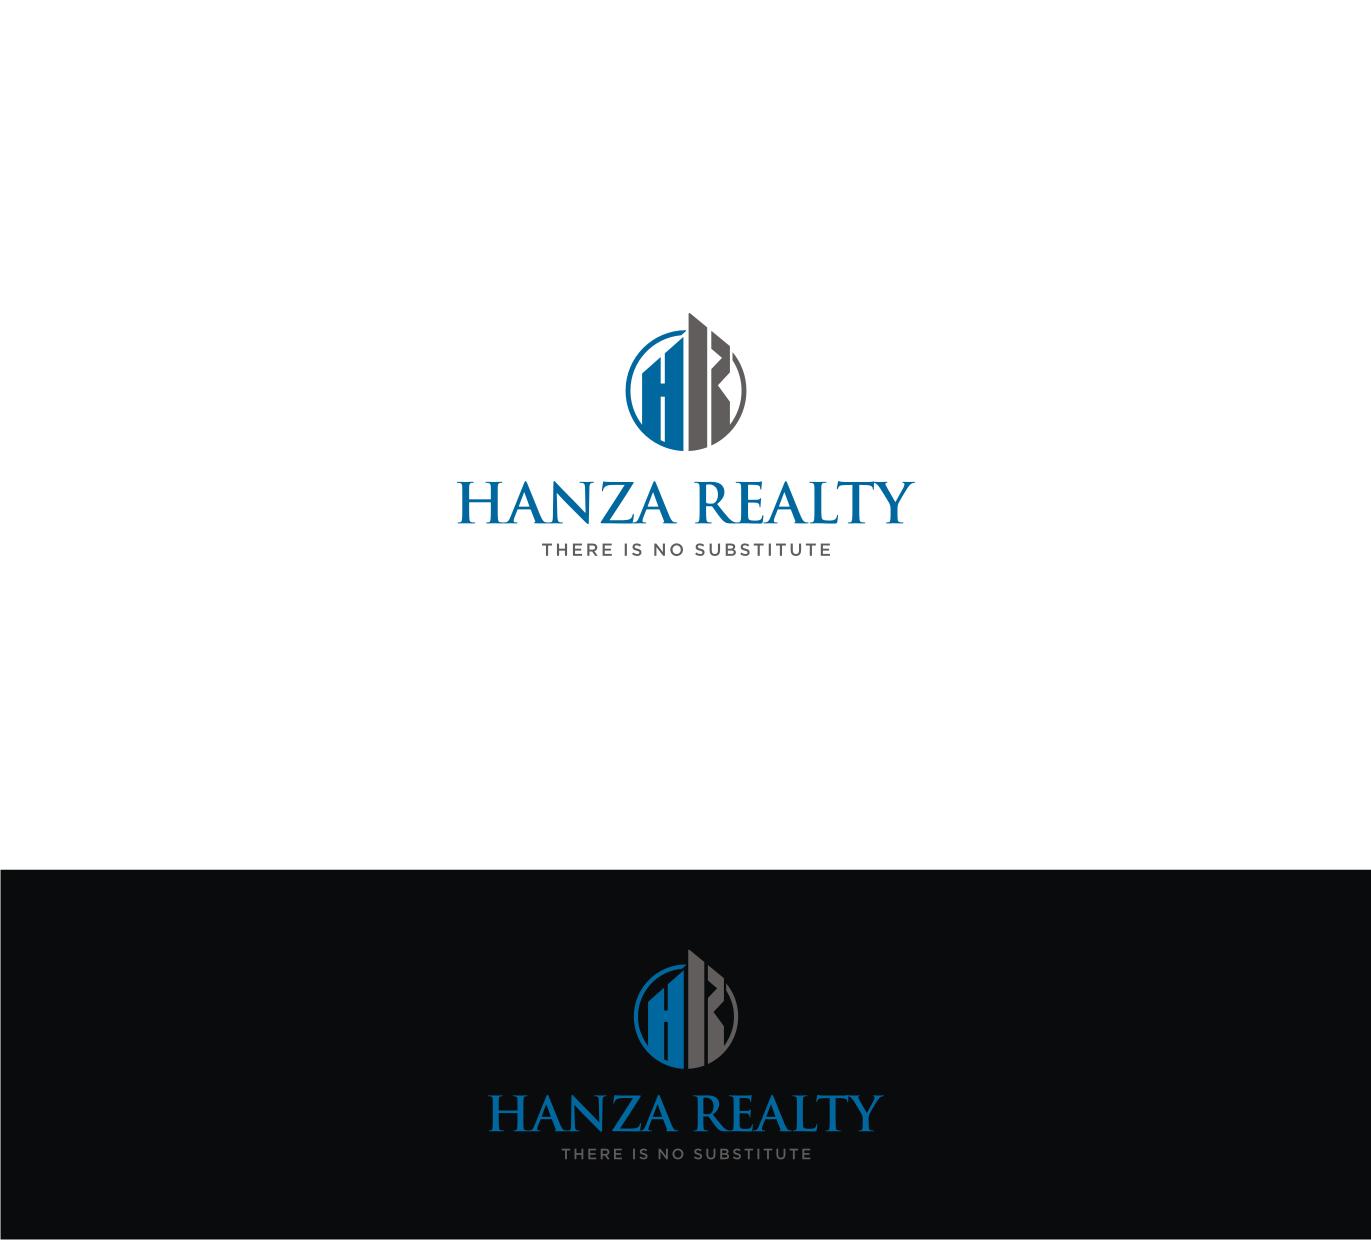 Logo Design by Sigitumarali Sigit - Entry No. 448 in the Logo Design Contest Logo Design for Hanza Realty.